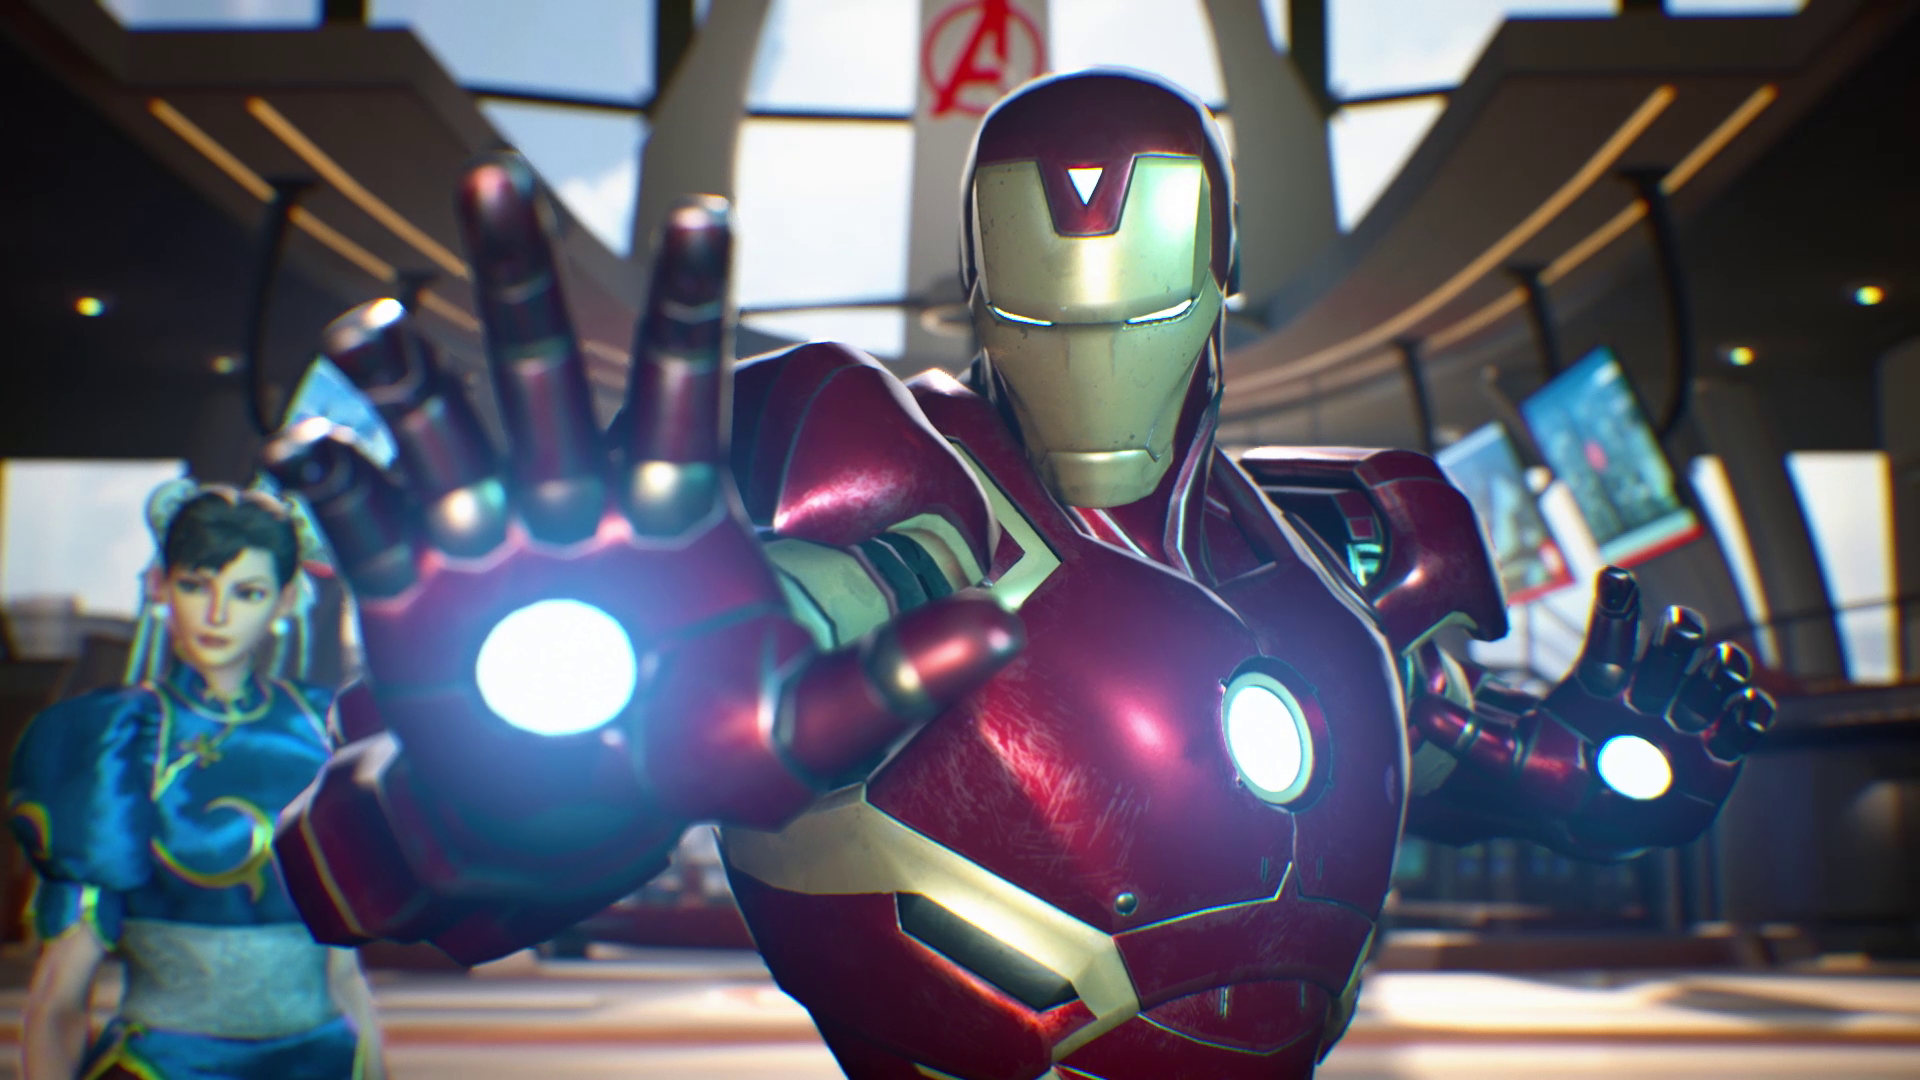 A screenshot from Marvel vs. Capcom: Infinite showing Iron Man flanked by Chun Li